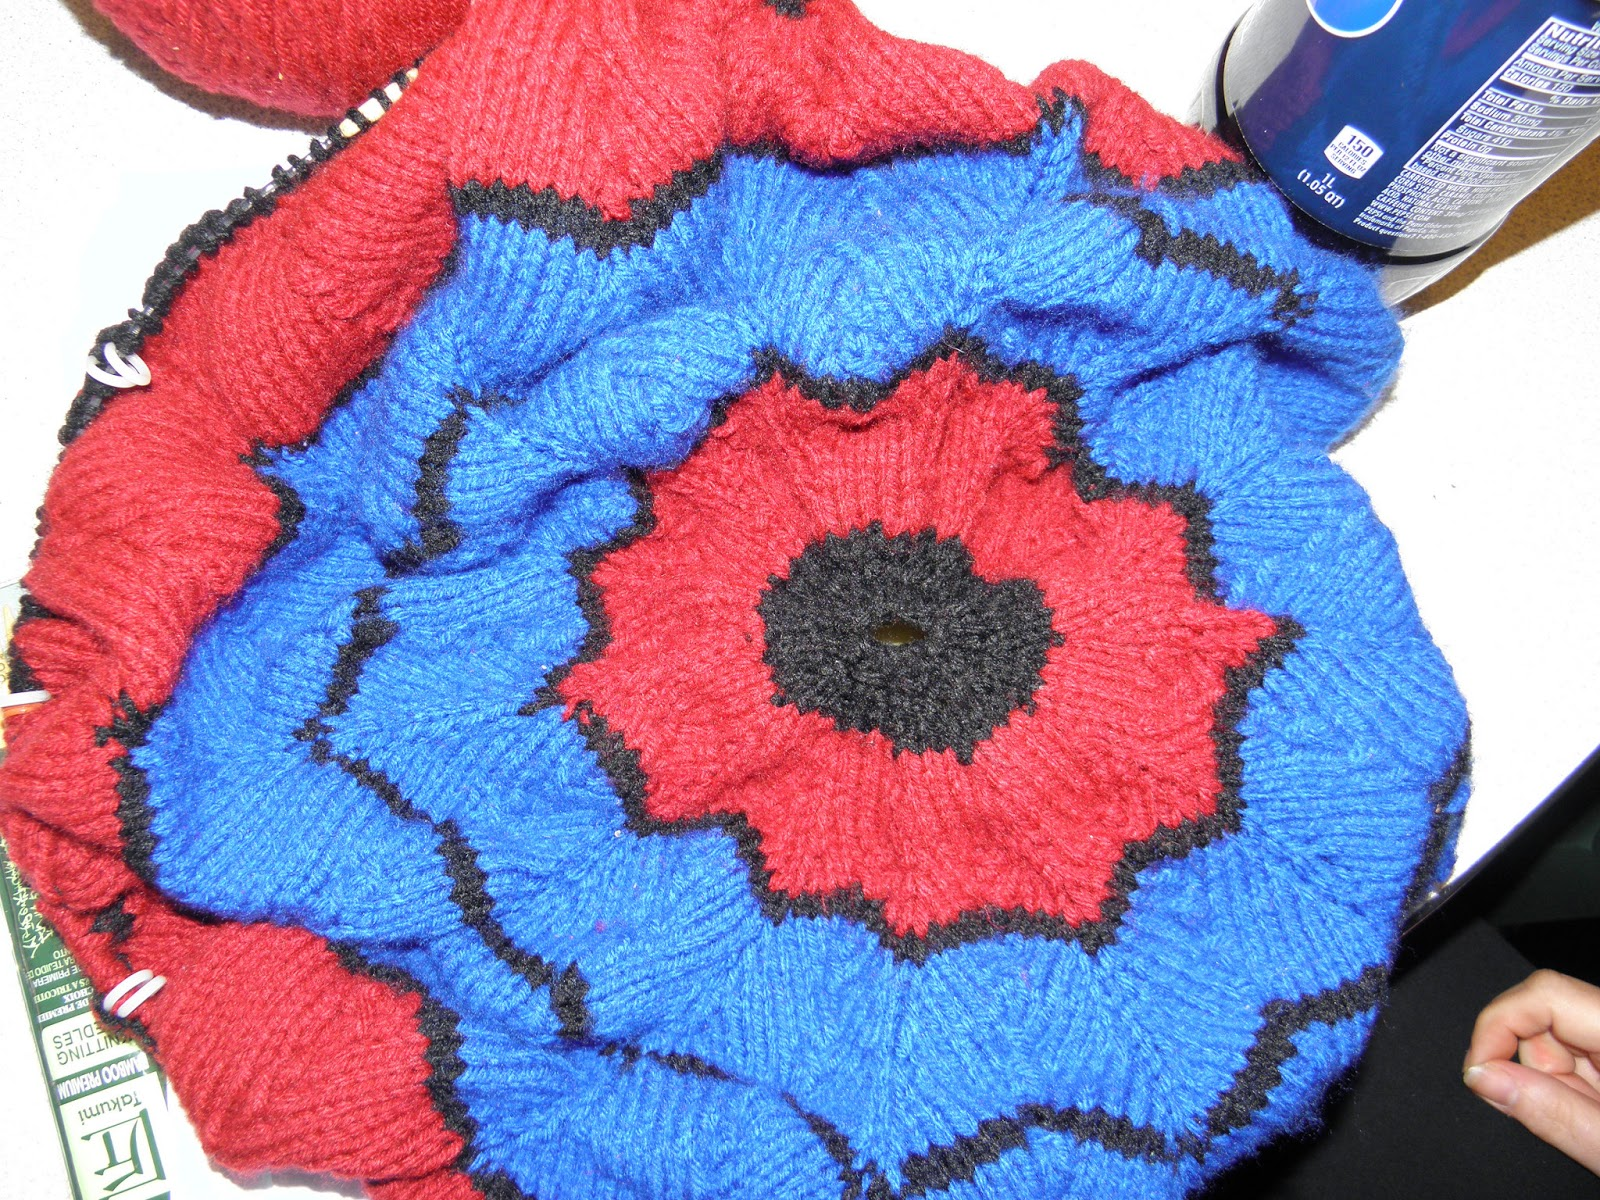 f1bercat\'s SlowKnitter: Eastside Stitchers Knit, Talk Babies (what ...